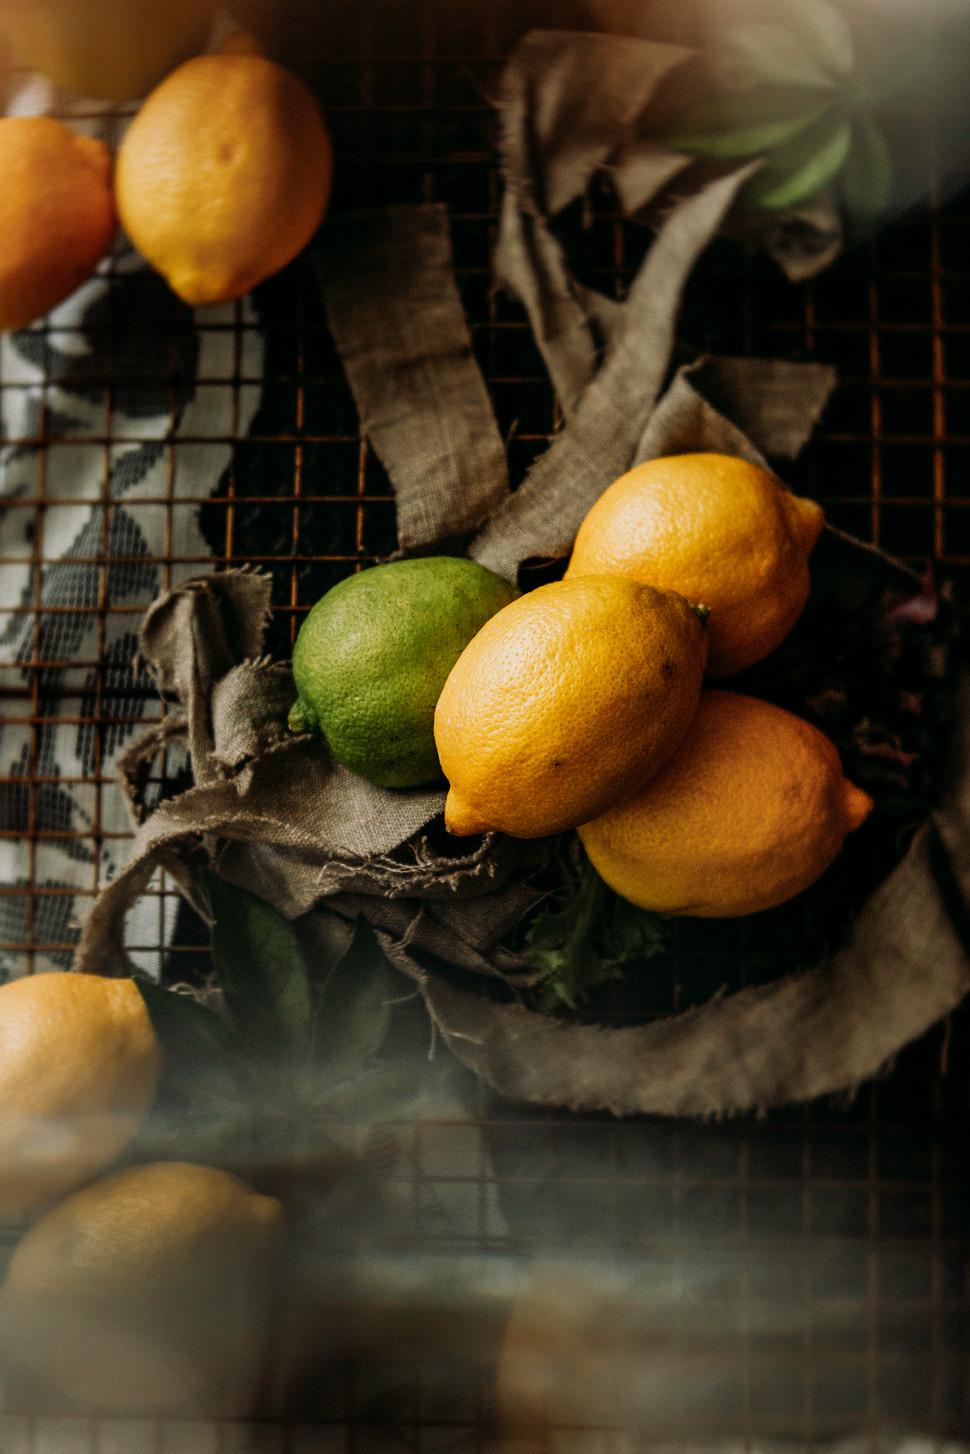 Hollie_Jeakins_Food_Photograhy_Lemons.jp